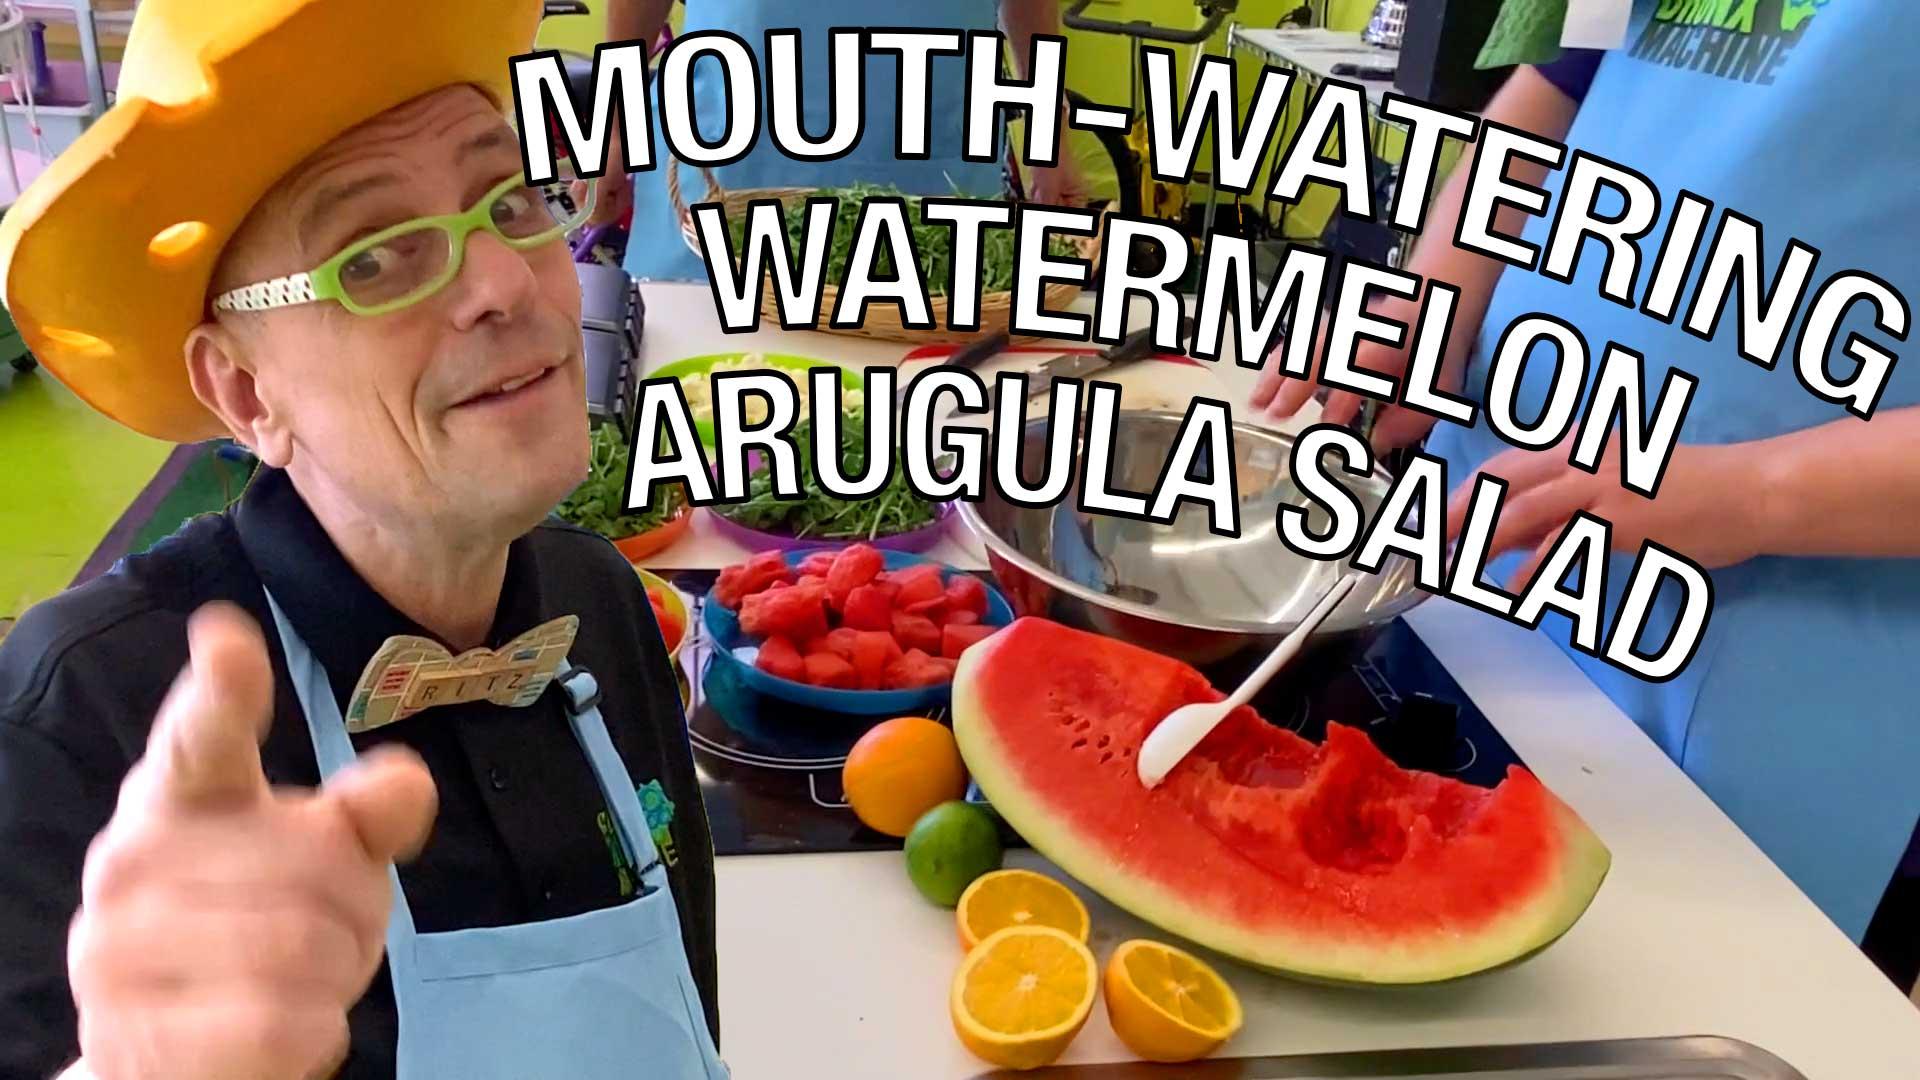 Mr.Ritz Makes Mouth Watering Watermelon-Arugula Salad-v3-COVER IMAGE